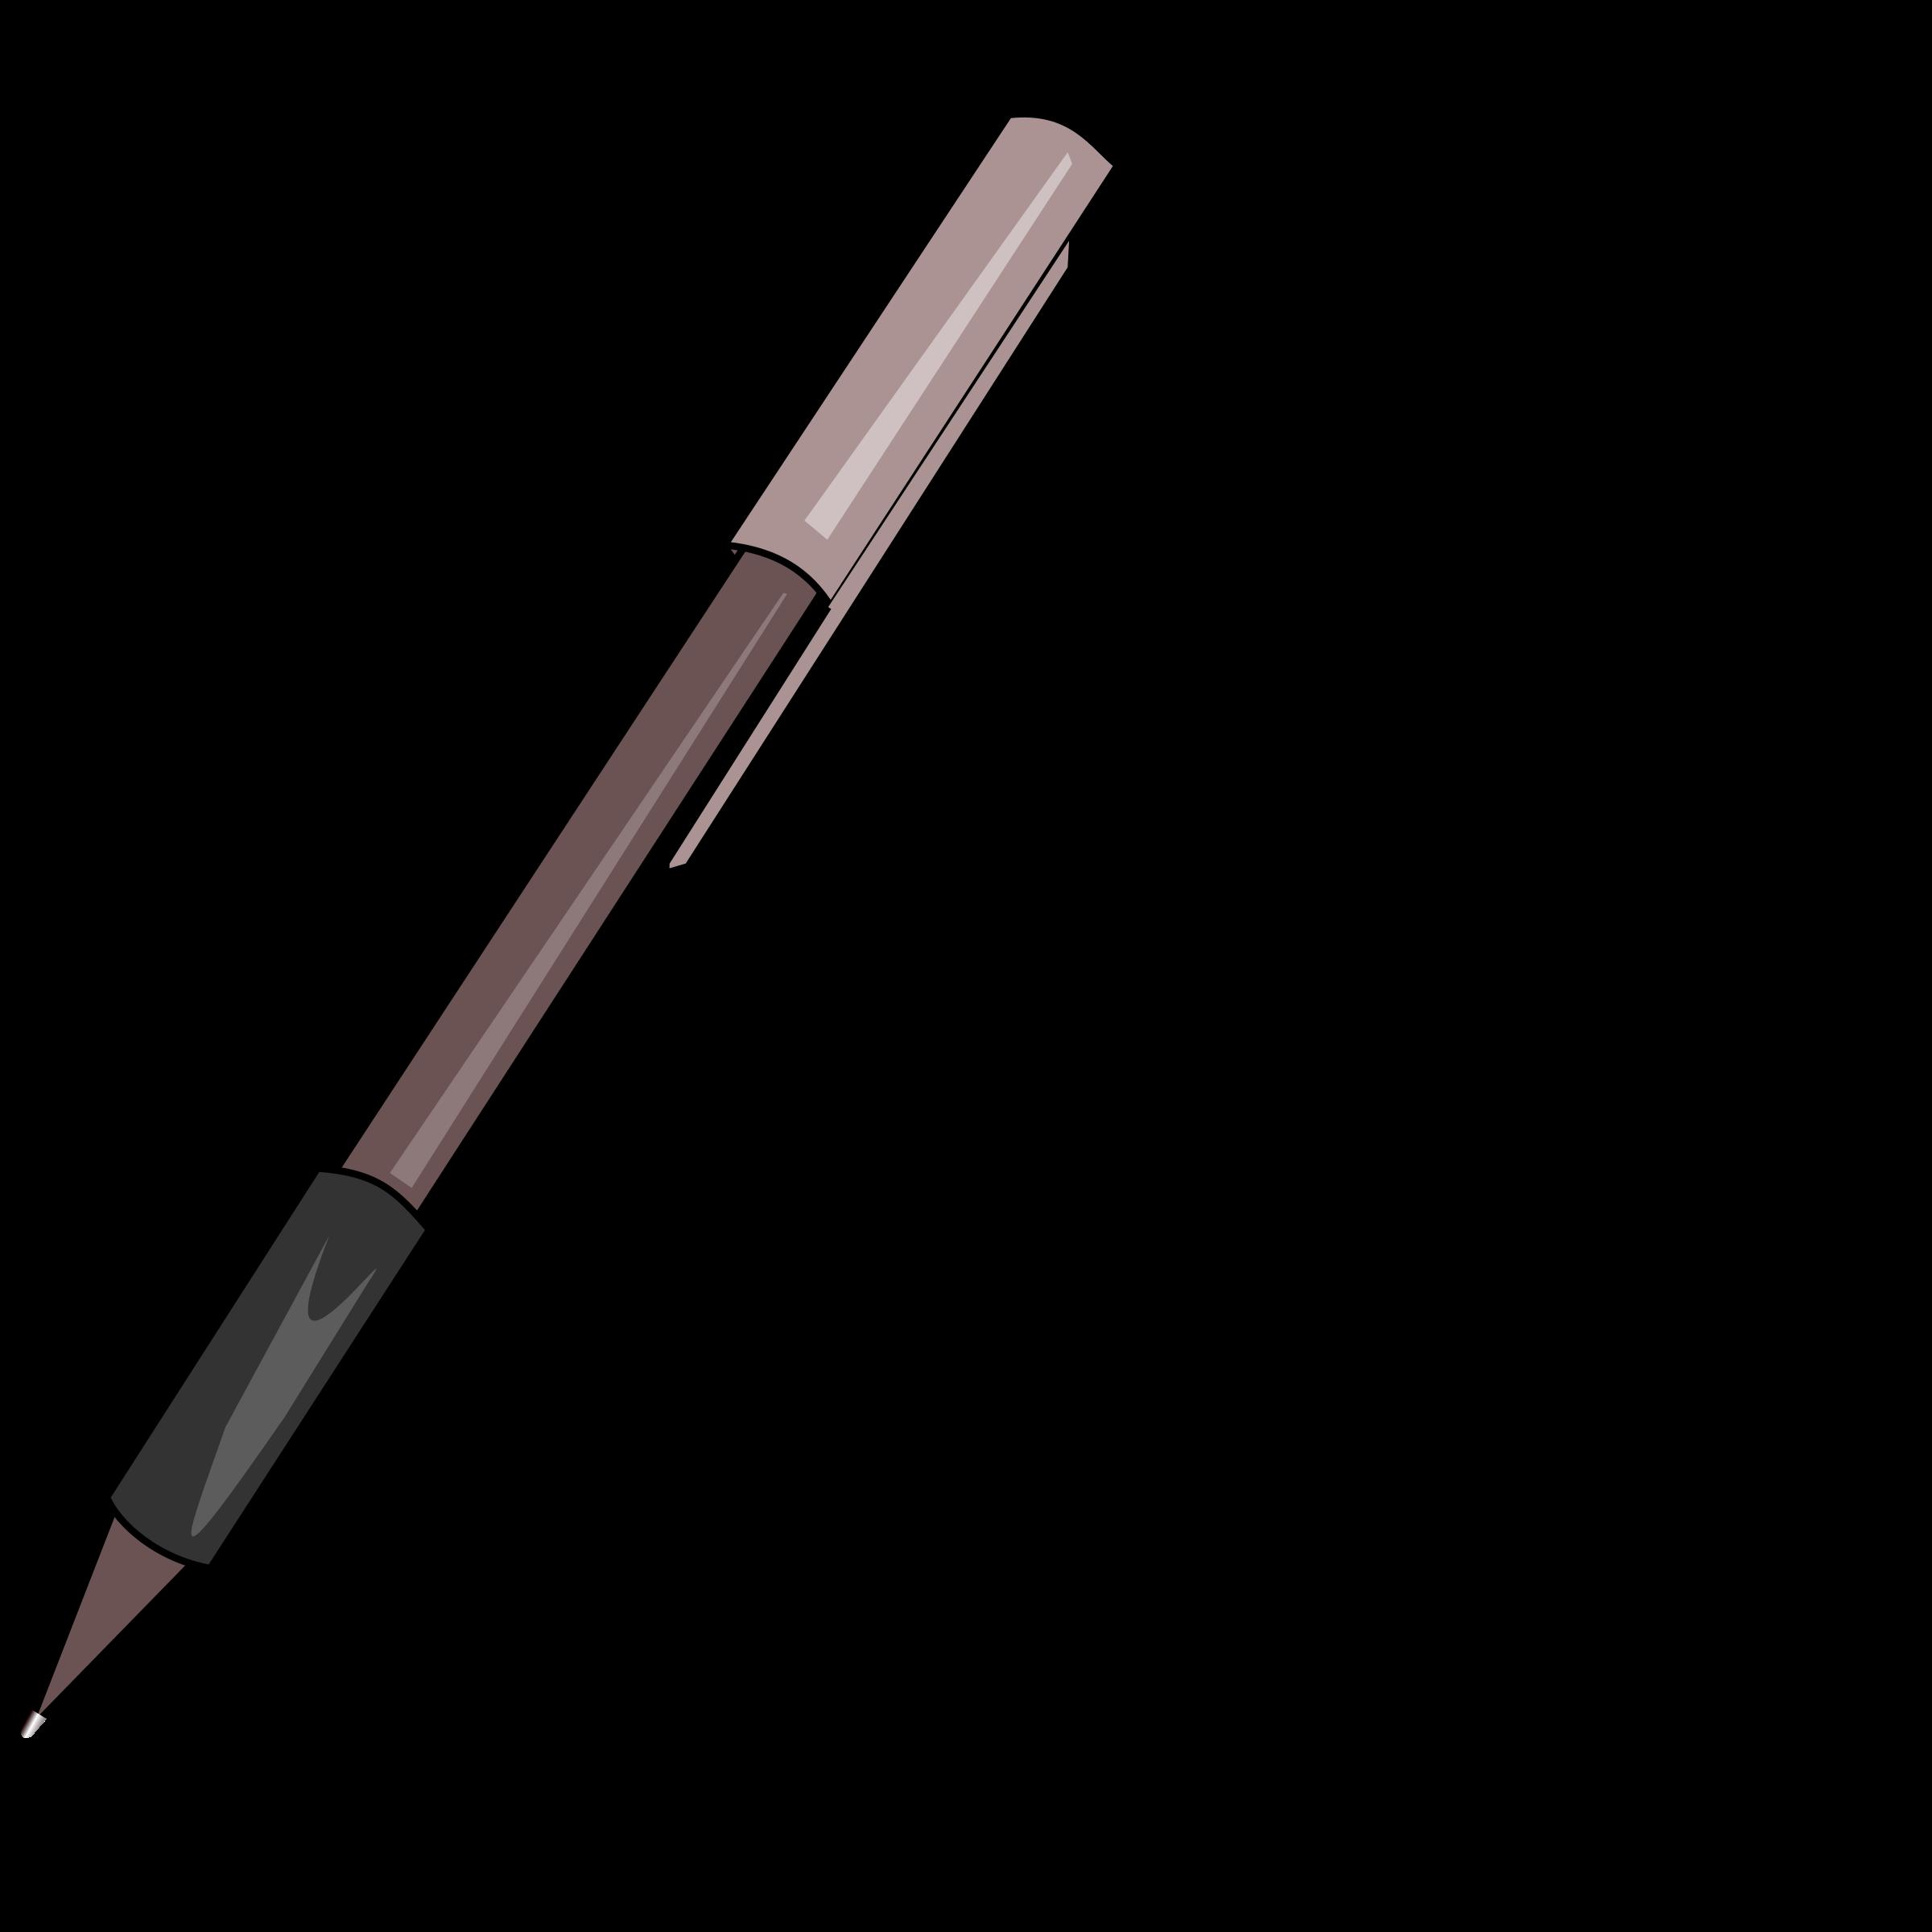 Grip pen big image. Paper clipart ballpen